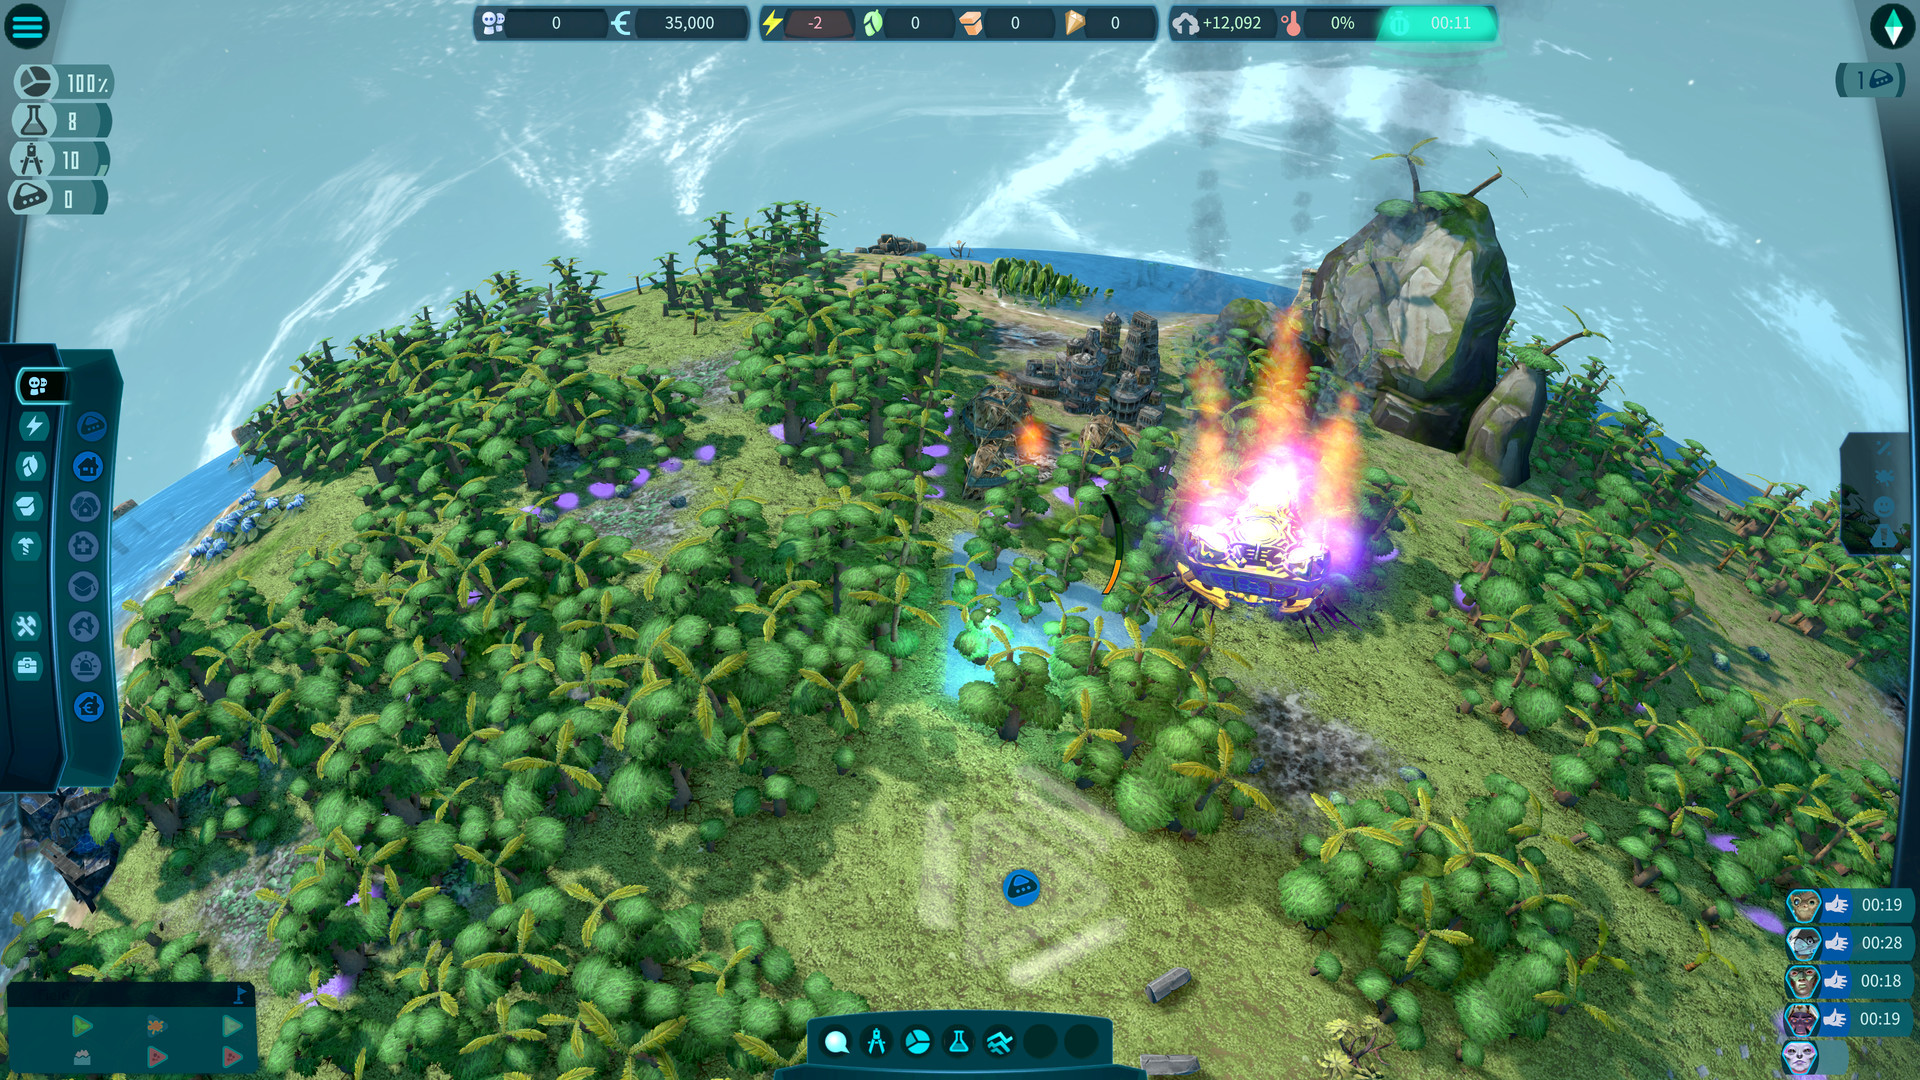 Save 25% on Imagine Earth on Steam